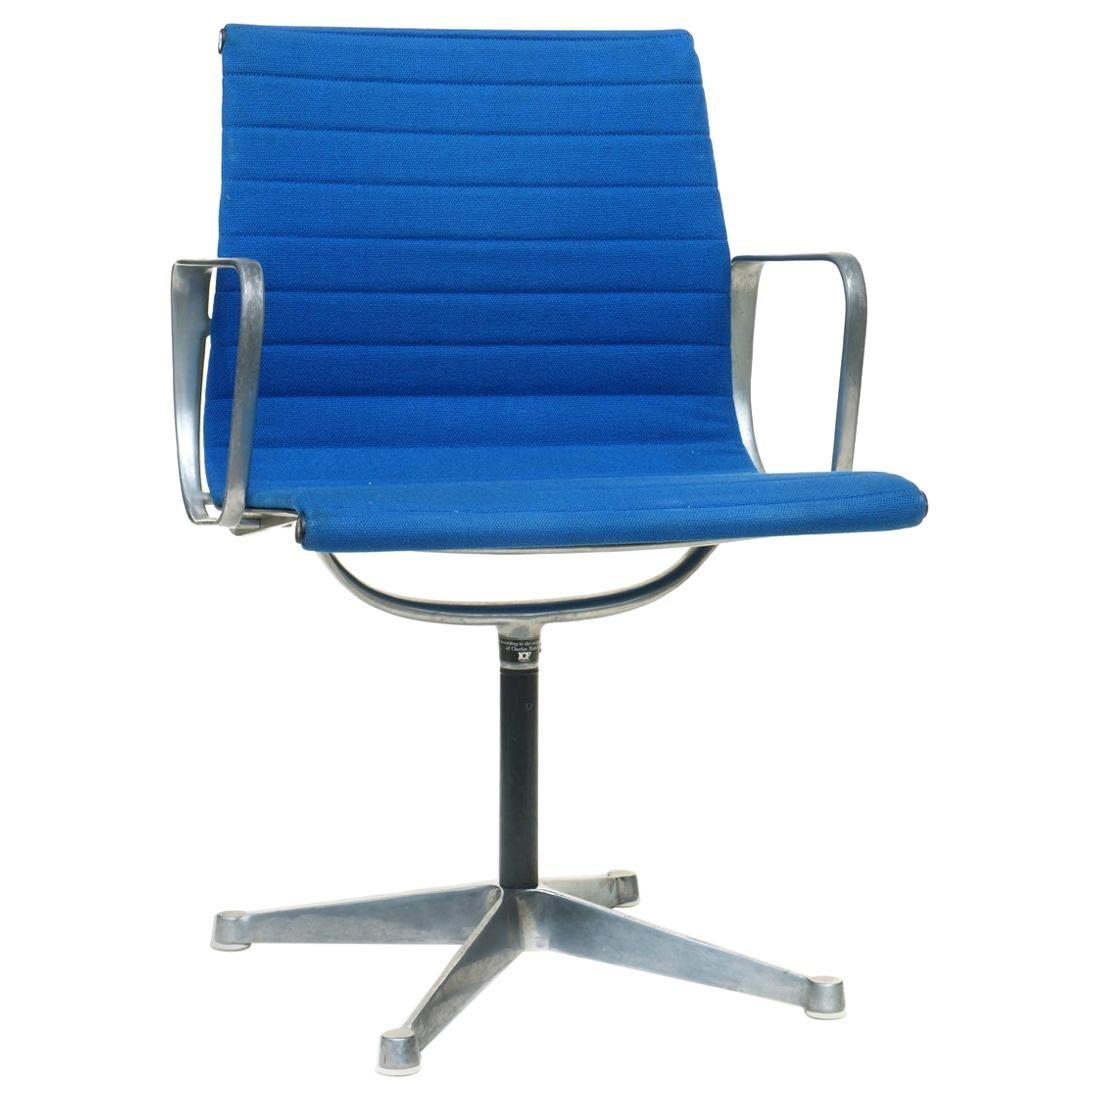 1960 EA 108 Charles Ray Eames Herman Miller ICF Design Blue Swivel Chair